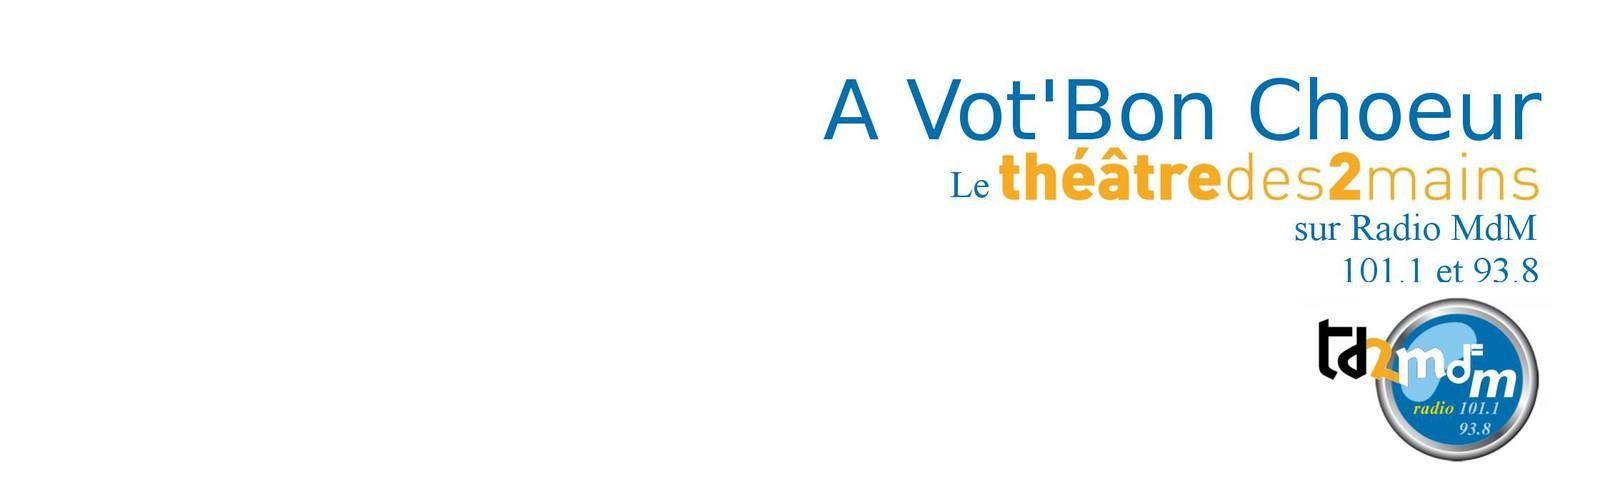 A Vot'Bon Choeur - Saison 02 - Correctif